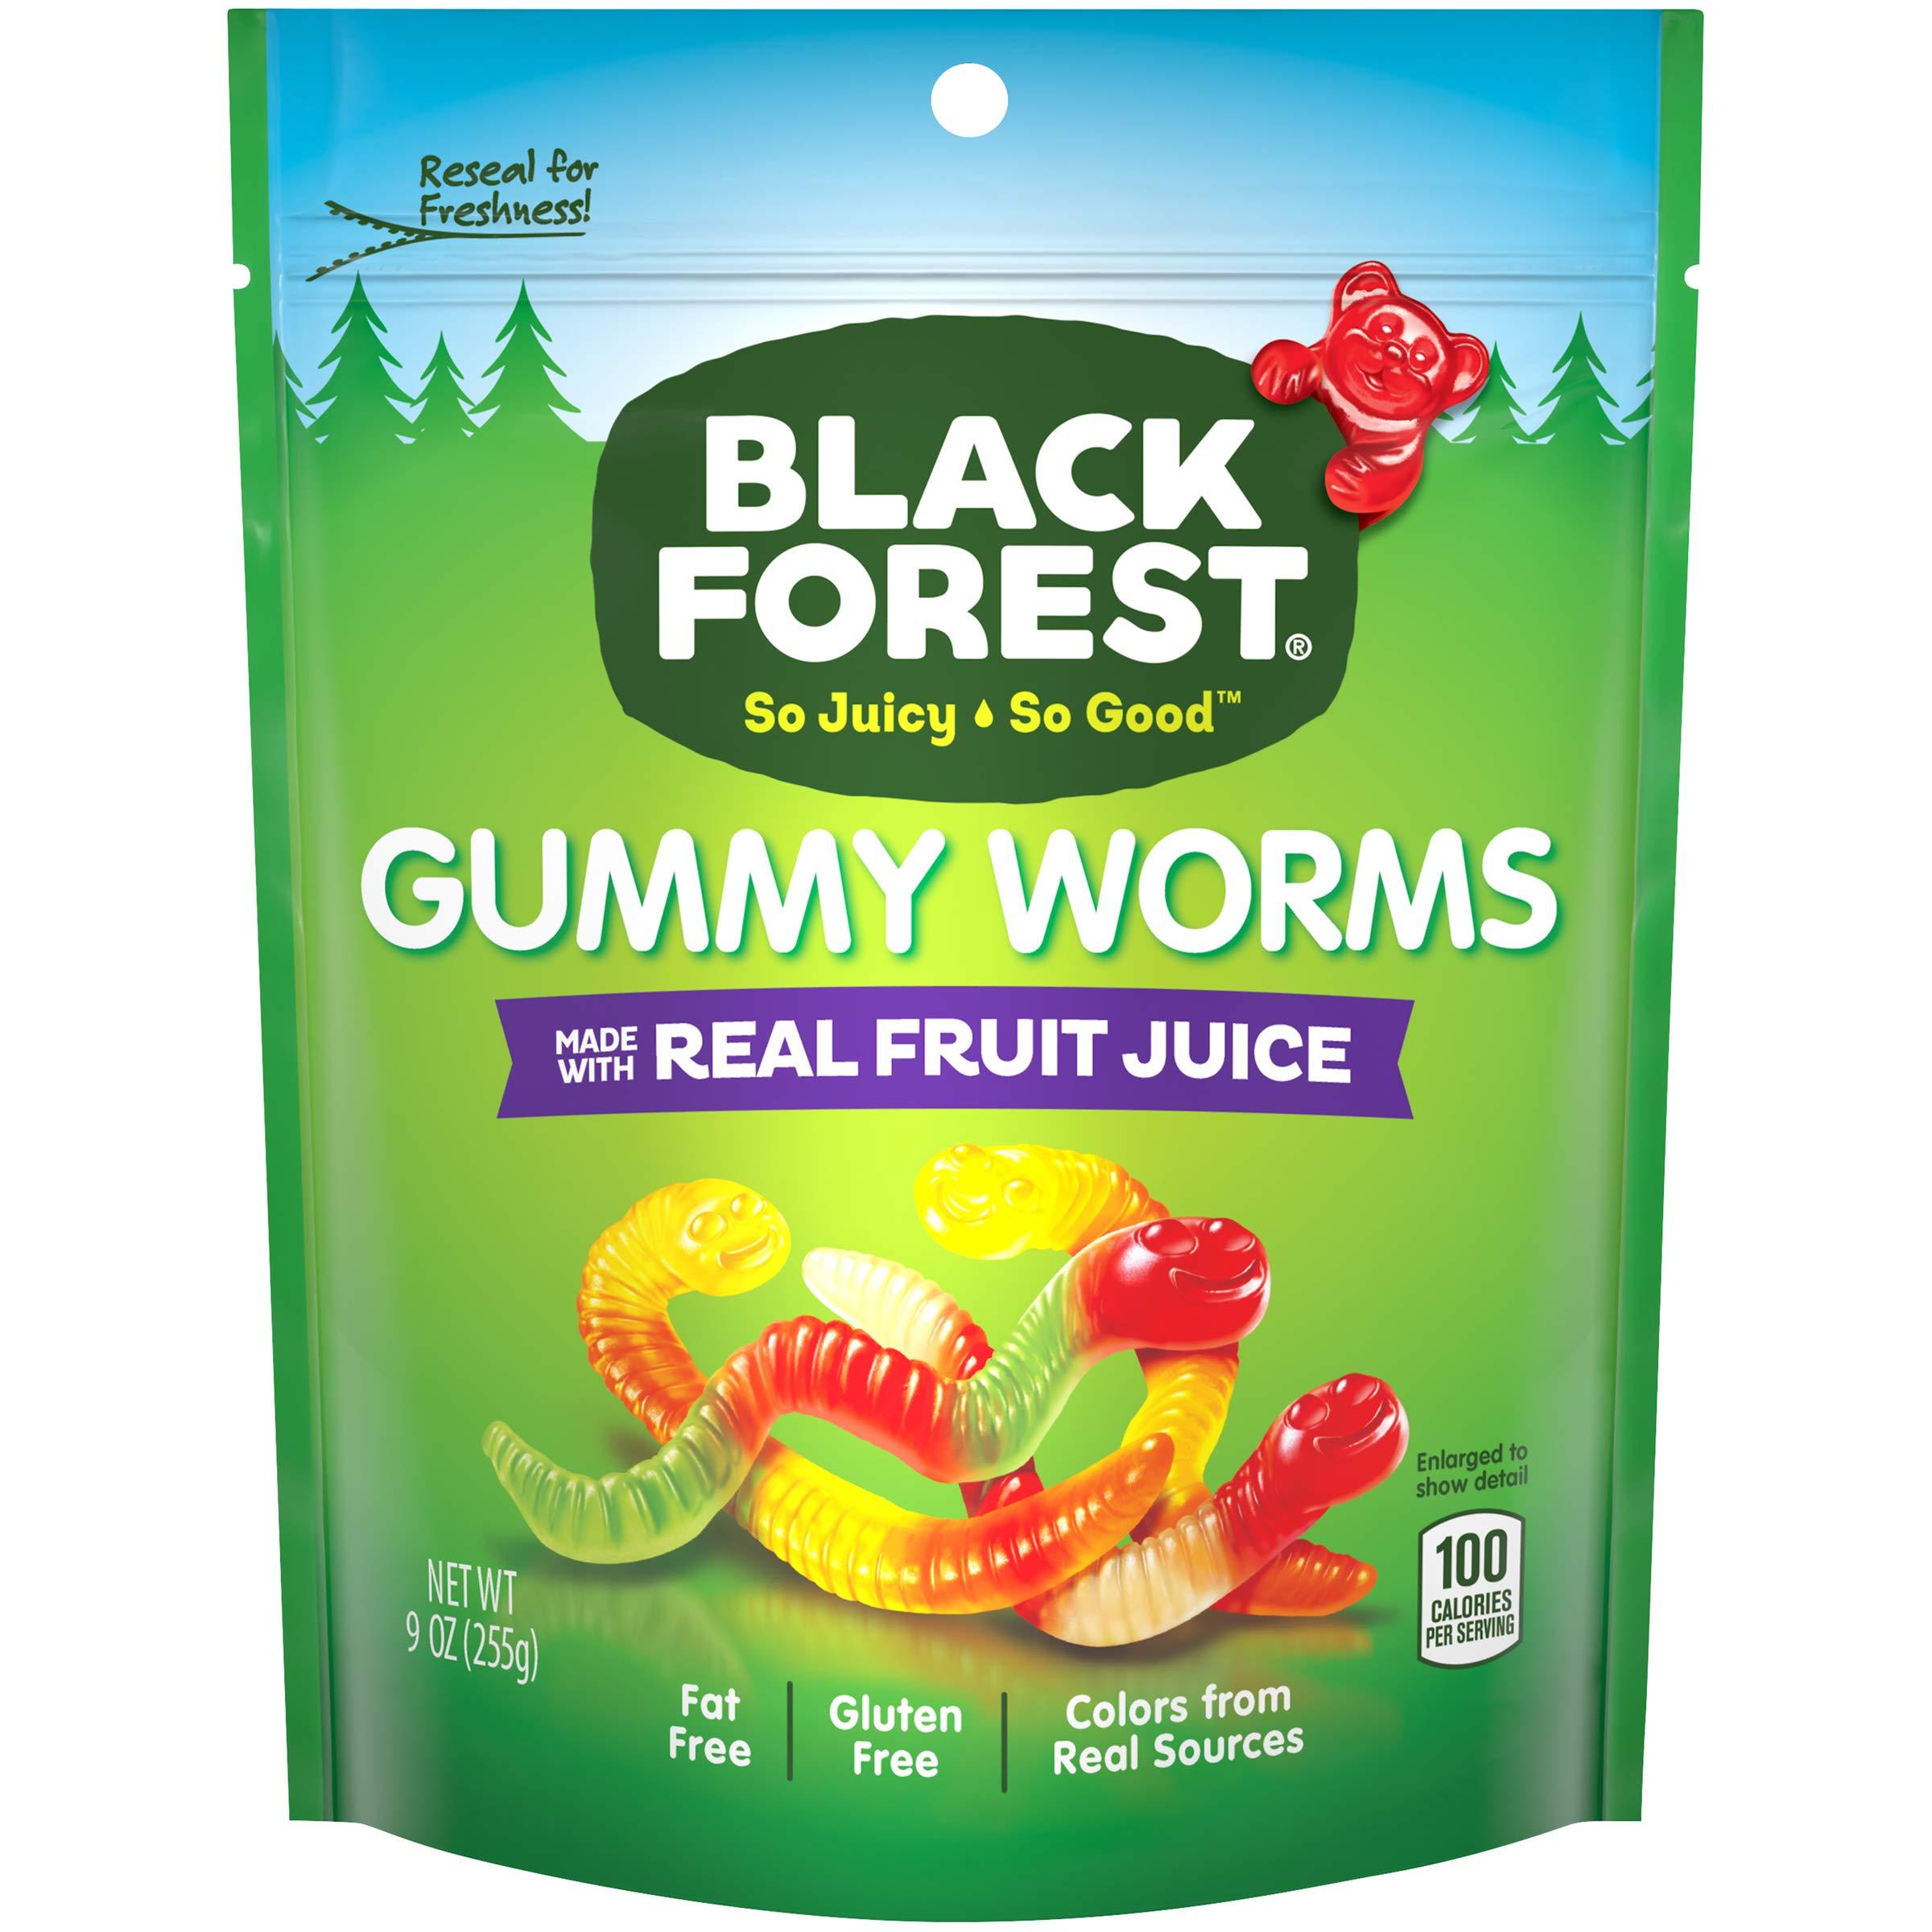 Black Forest Gummy Worms, 9 Oz.